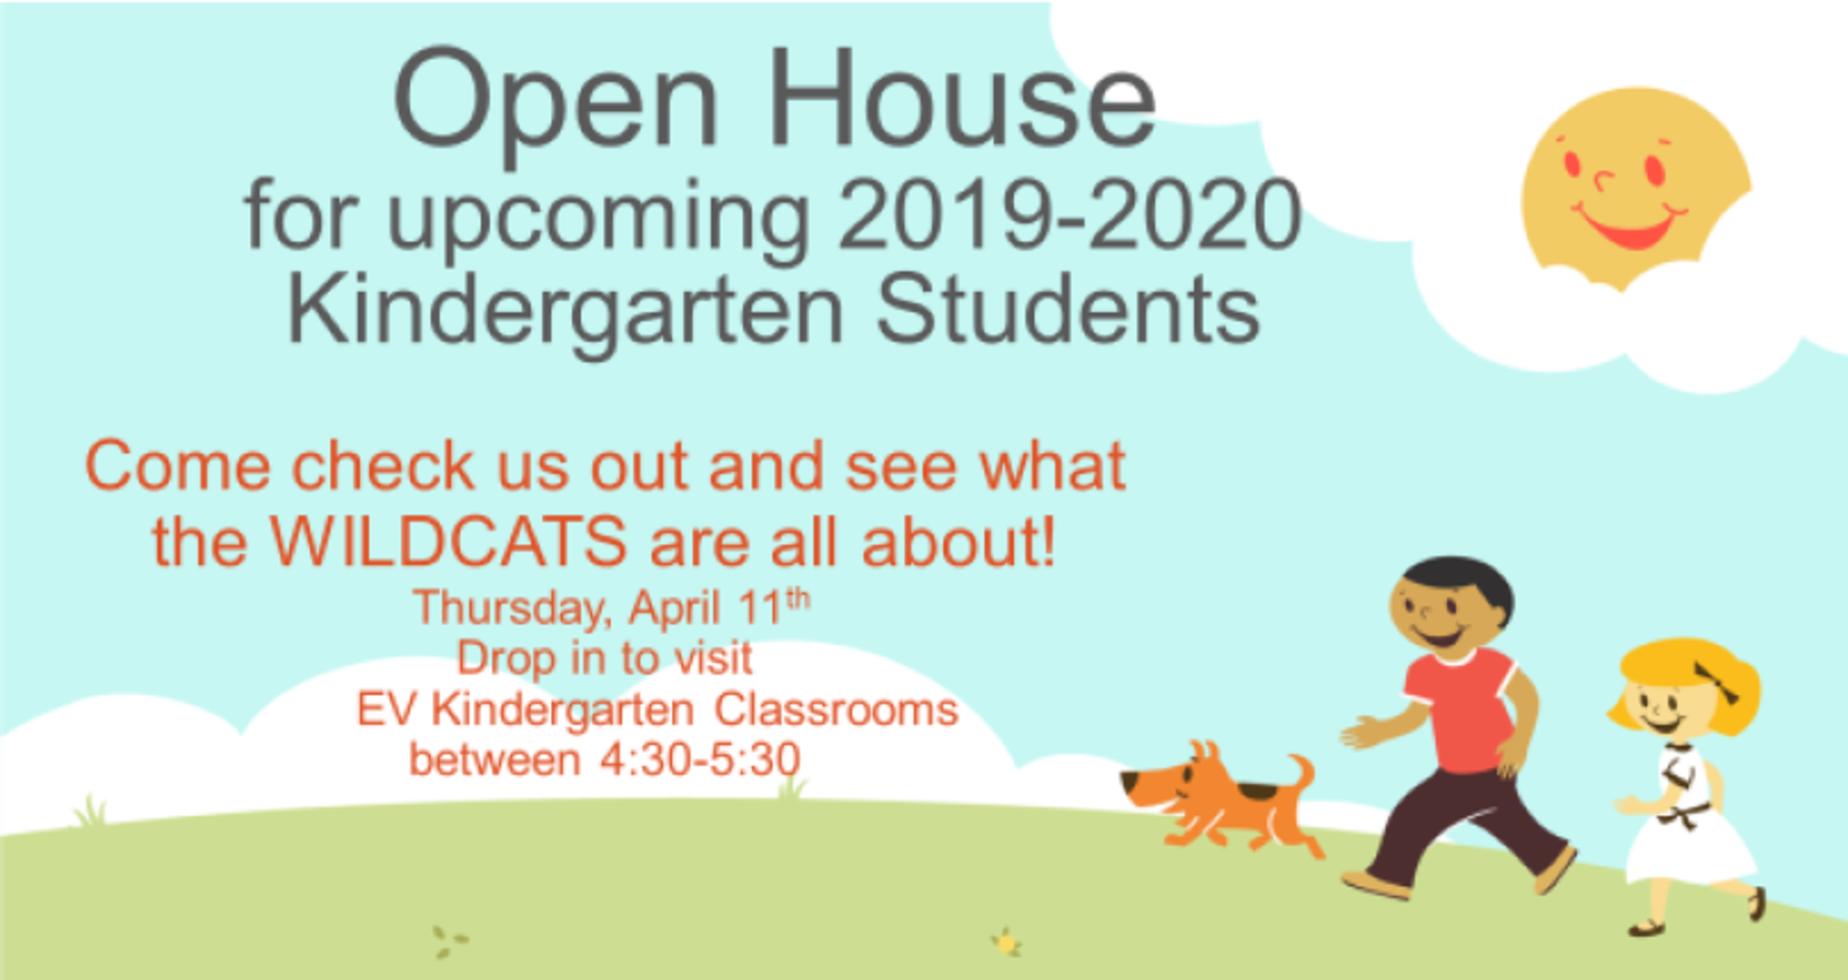 Open House Invitation